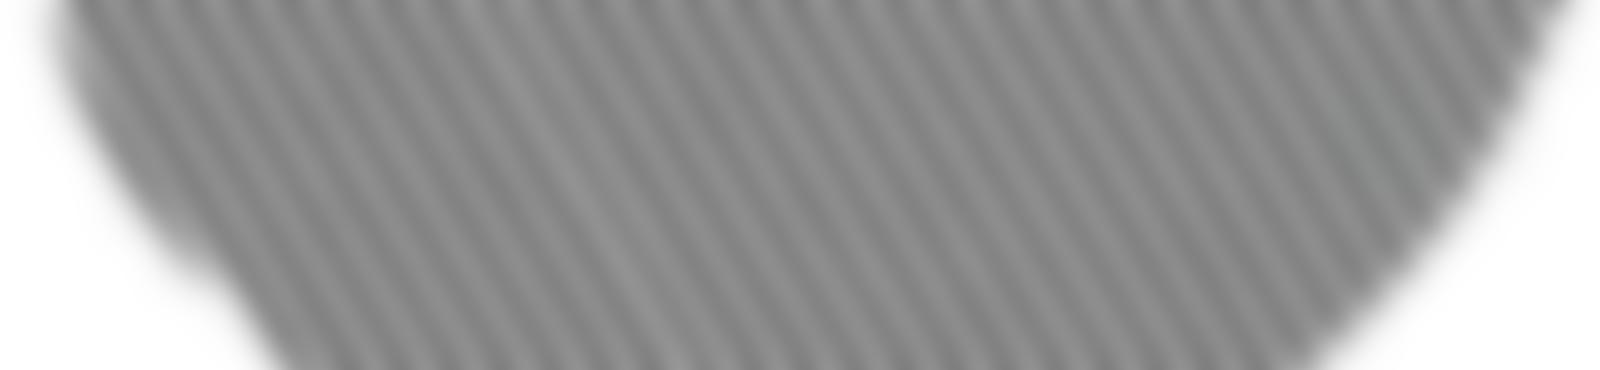 Blurred greyzone